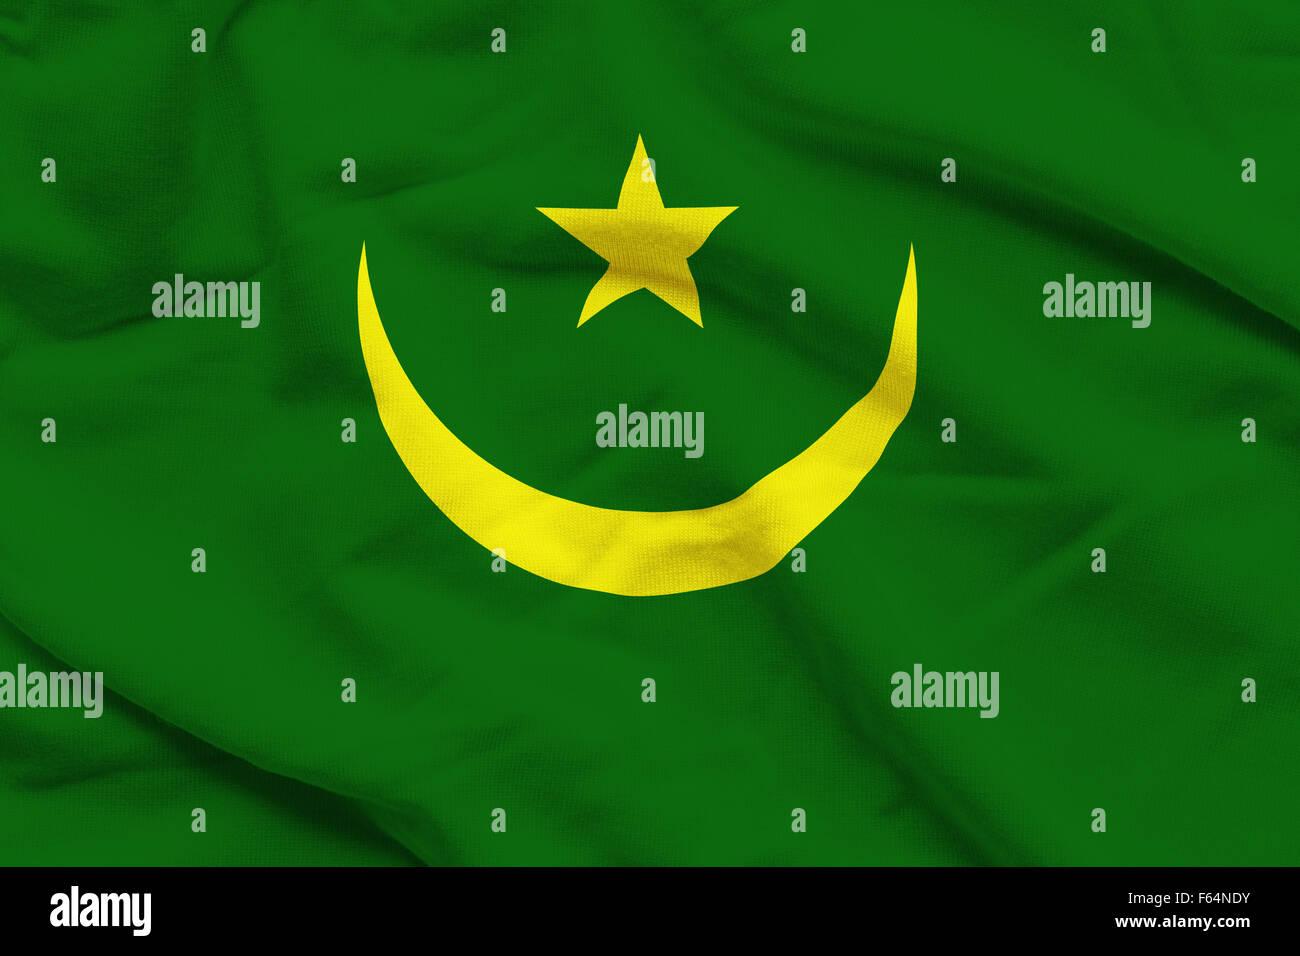 Wavy and rippled national flag of Mauritania background. - Stock Image